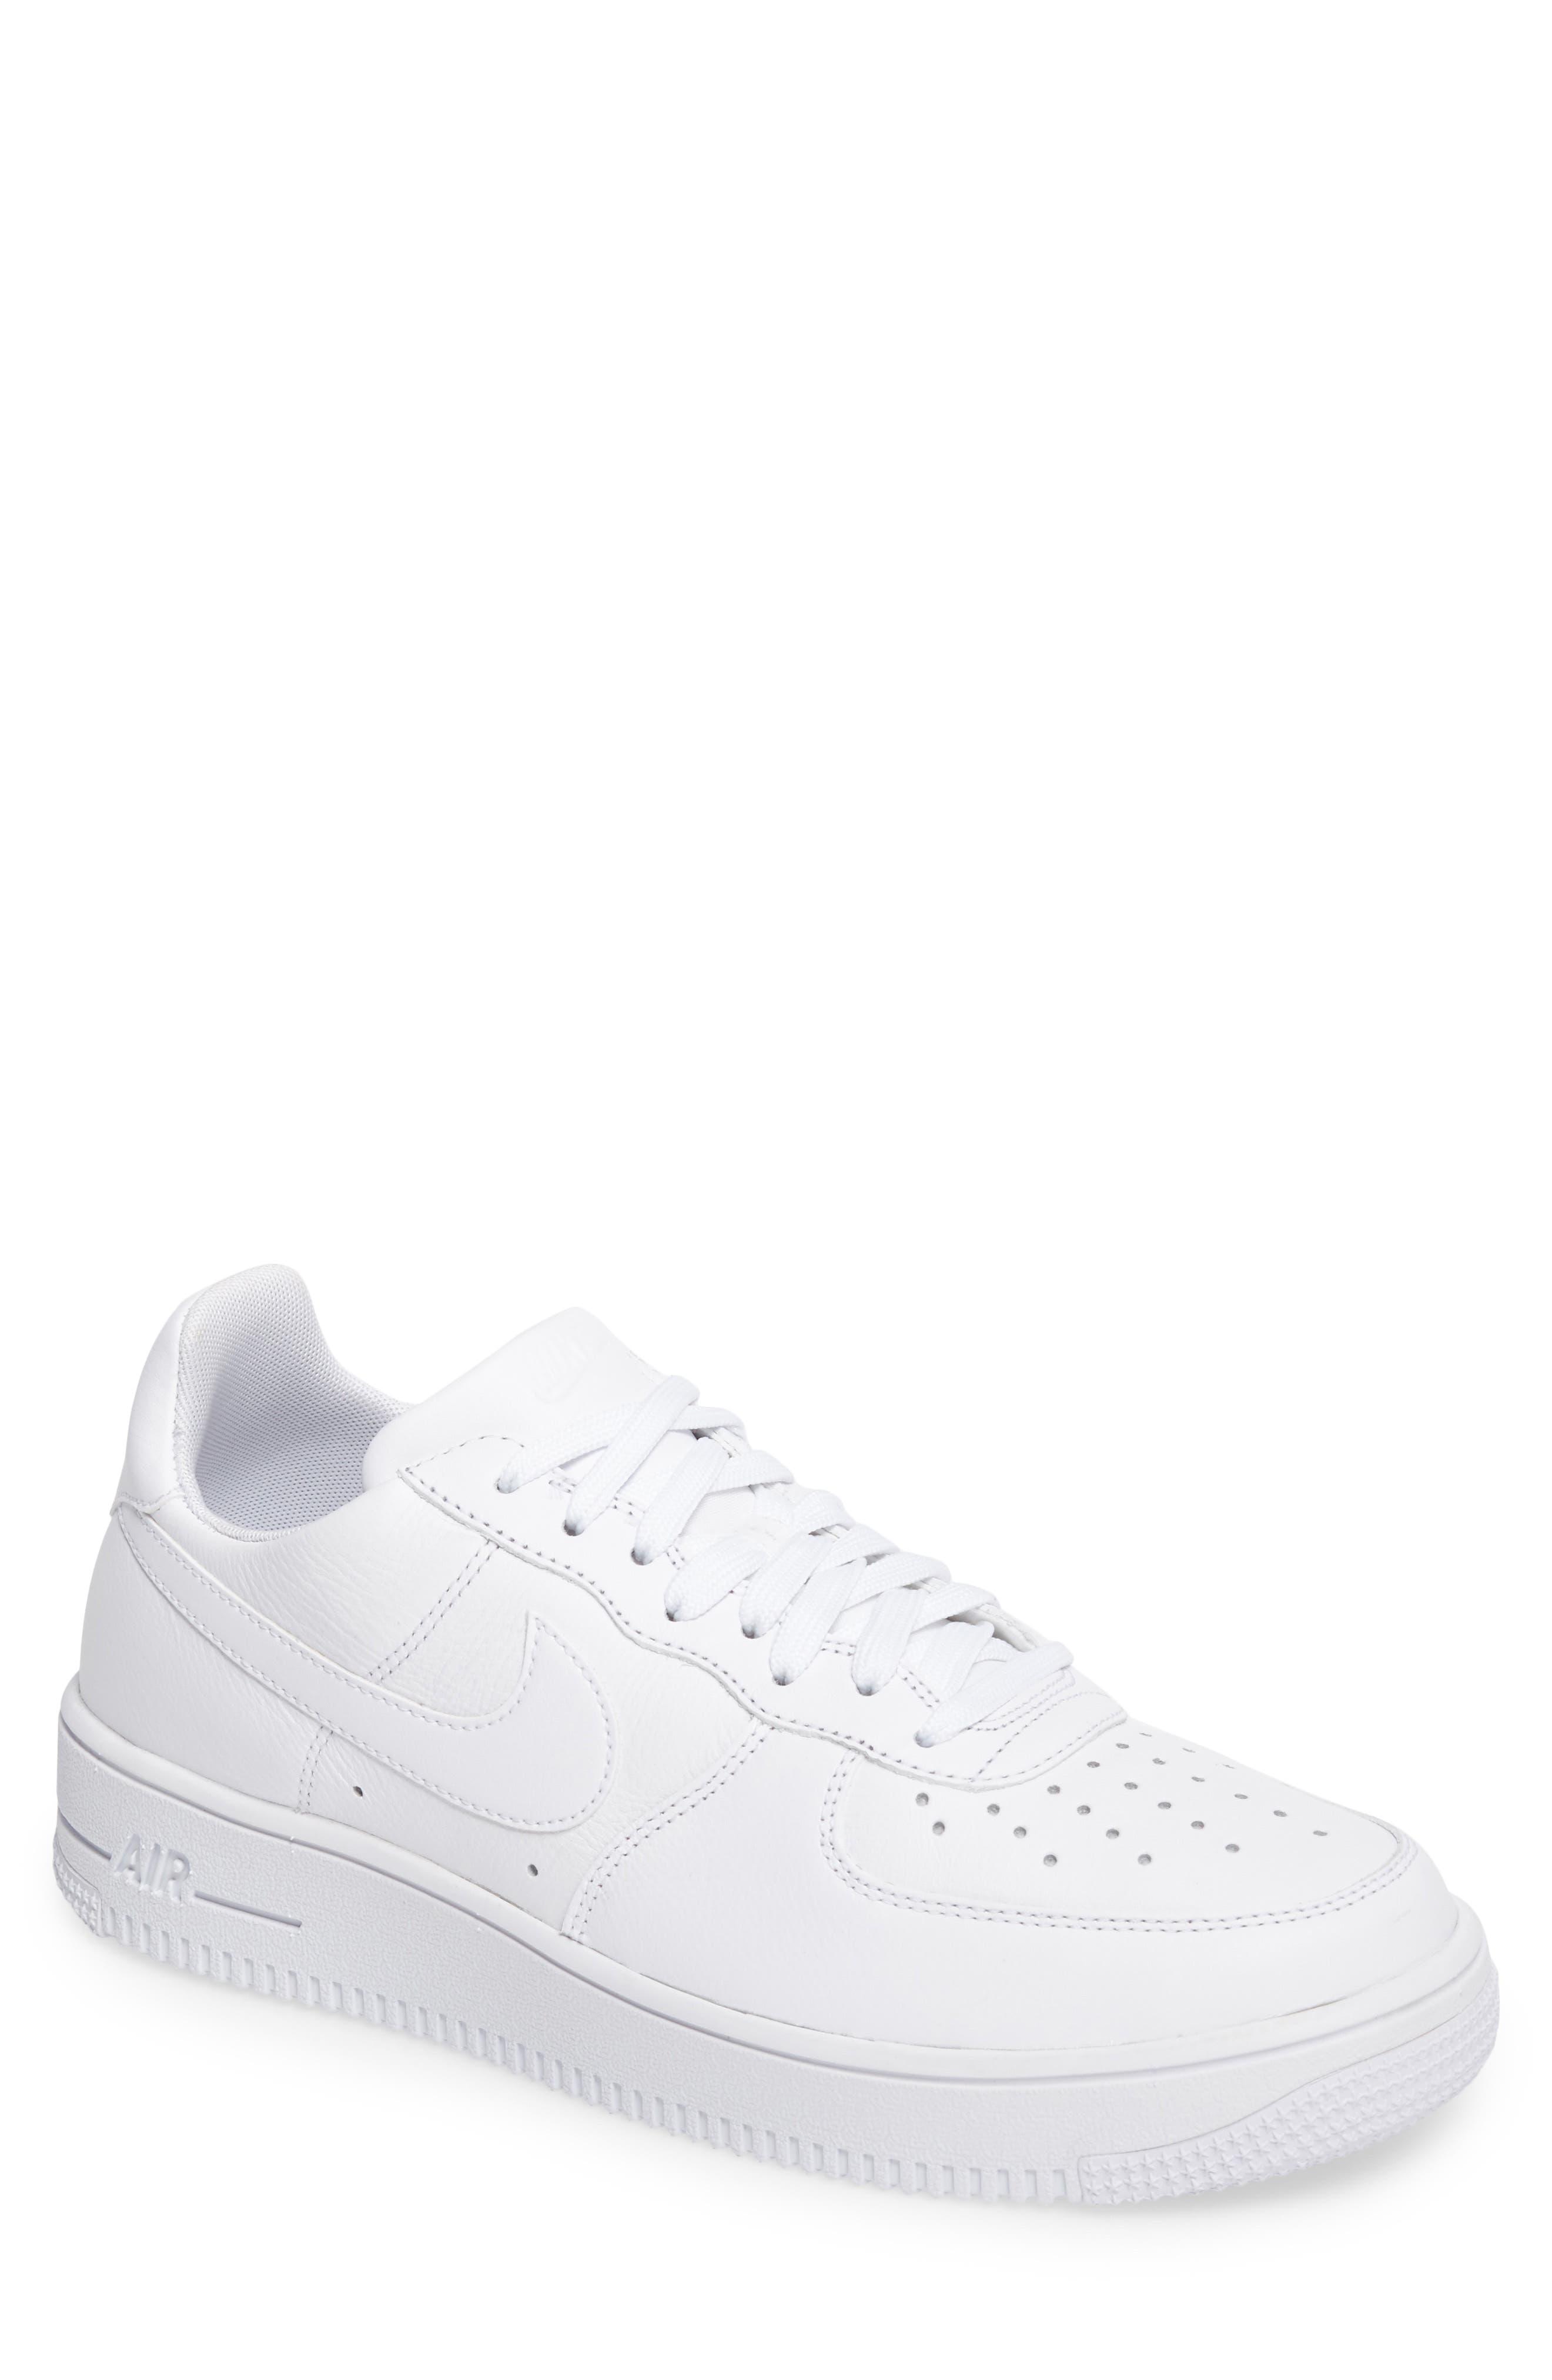 Air Force 1 Ultraforce Sneaker,                             Main thumbnail 2, color,